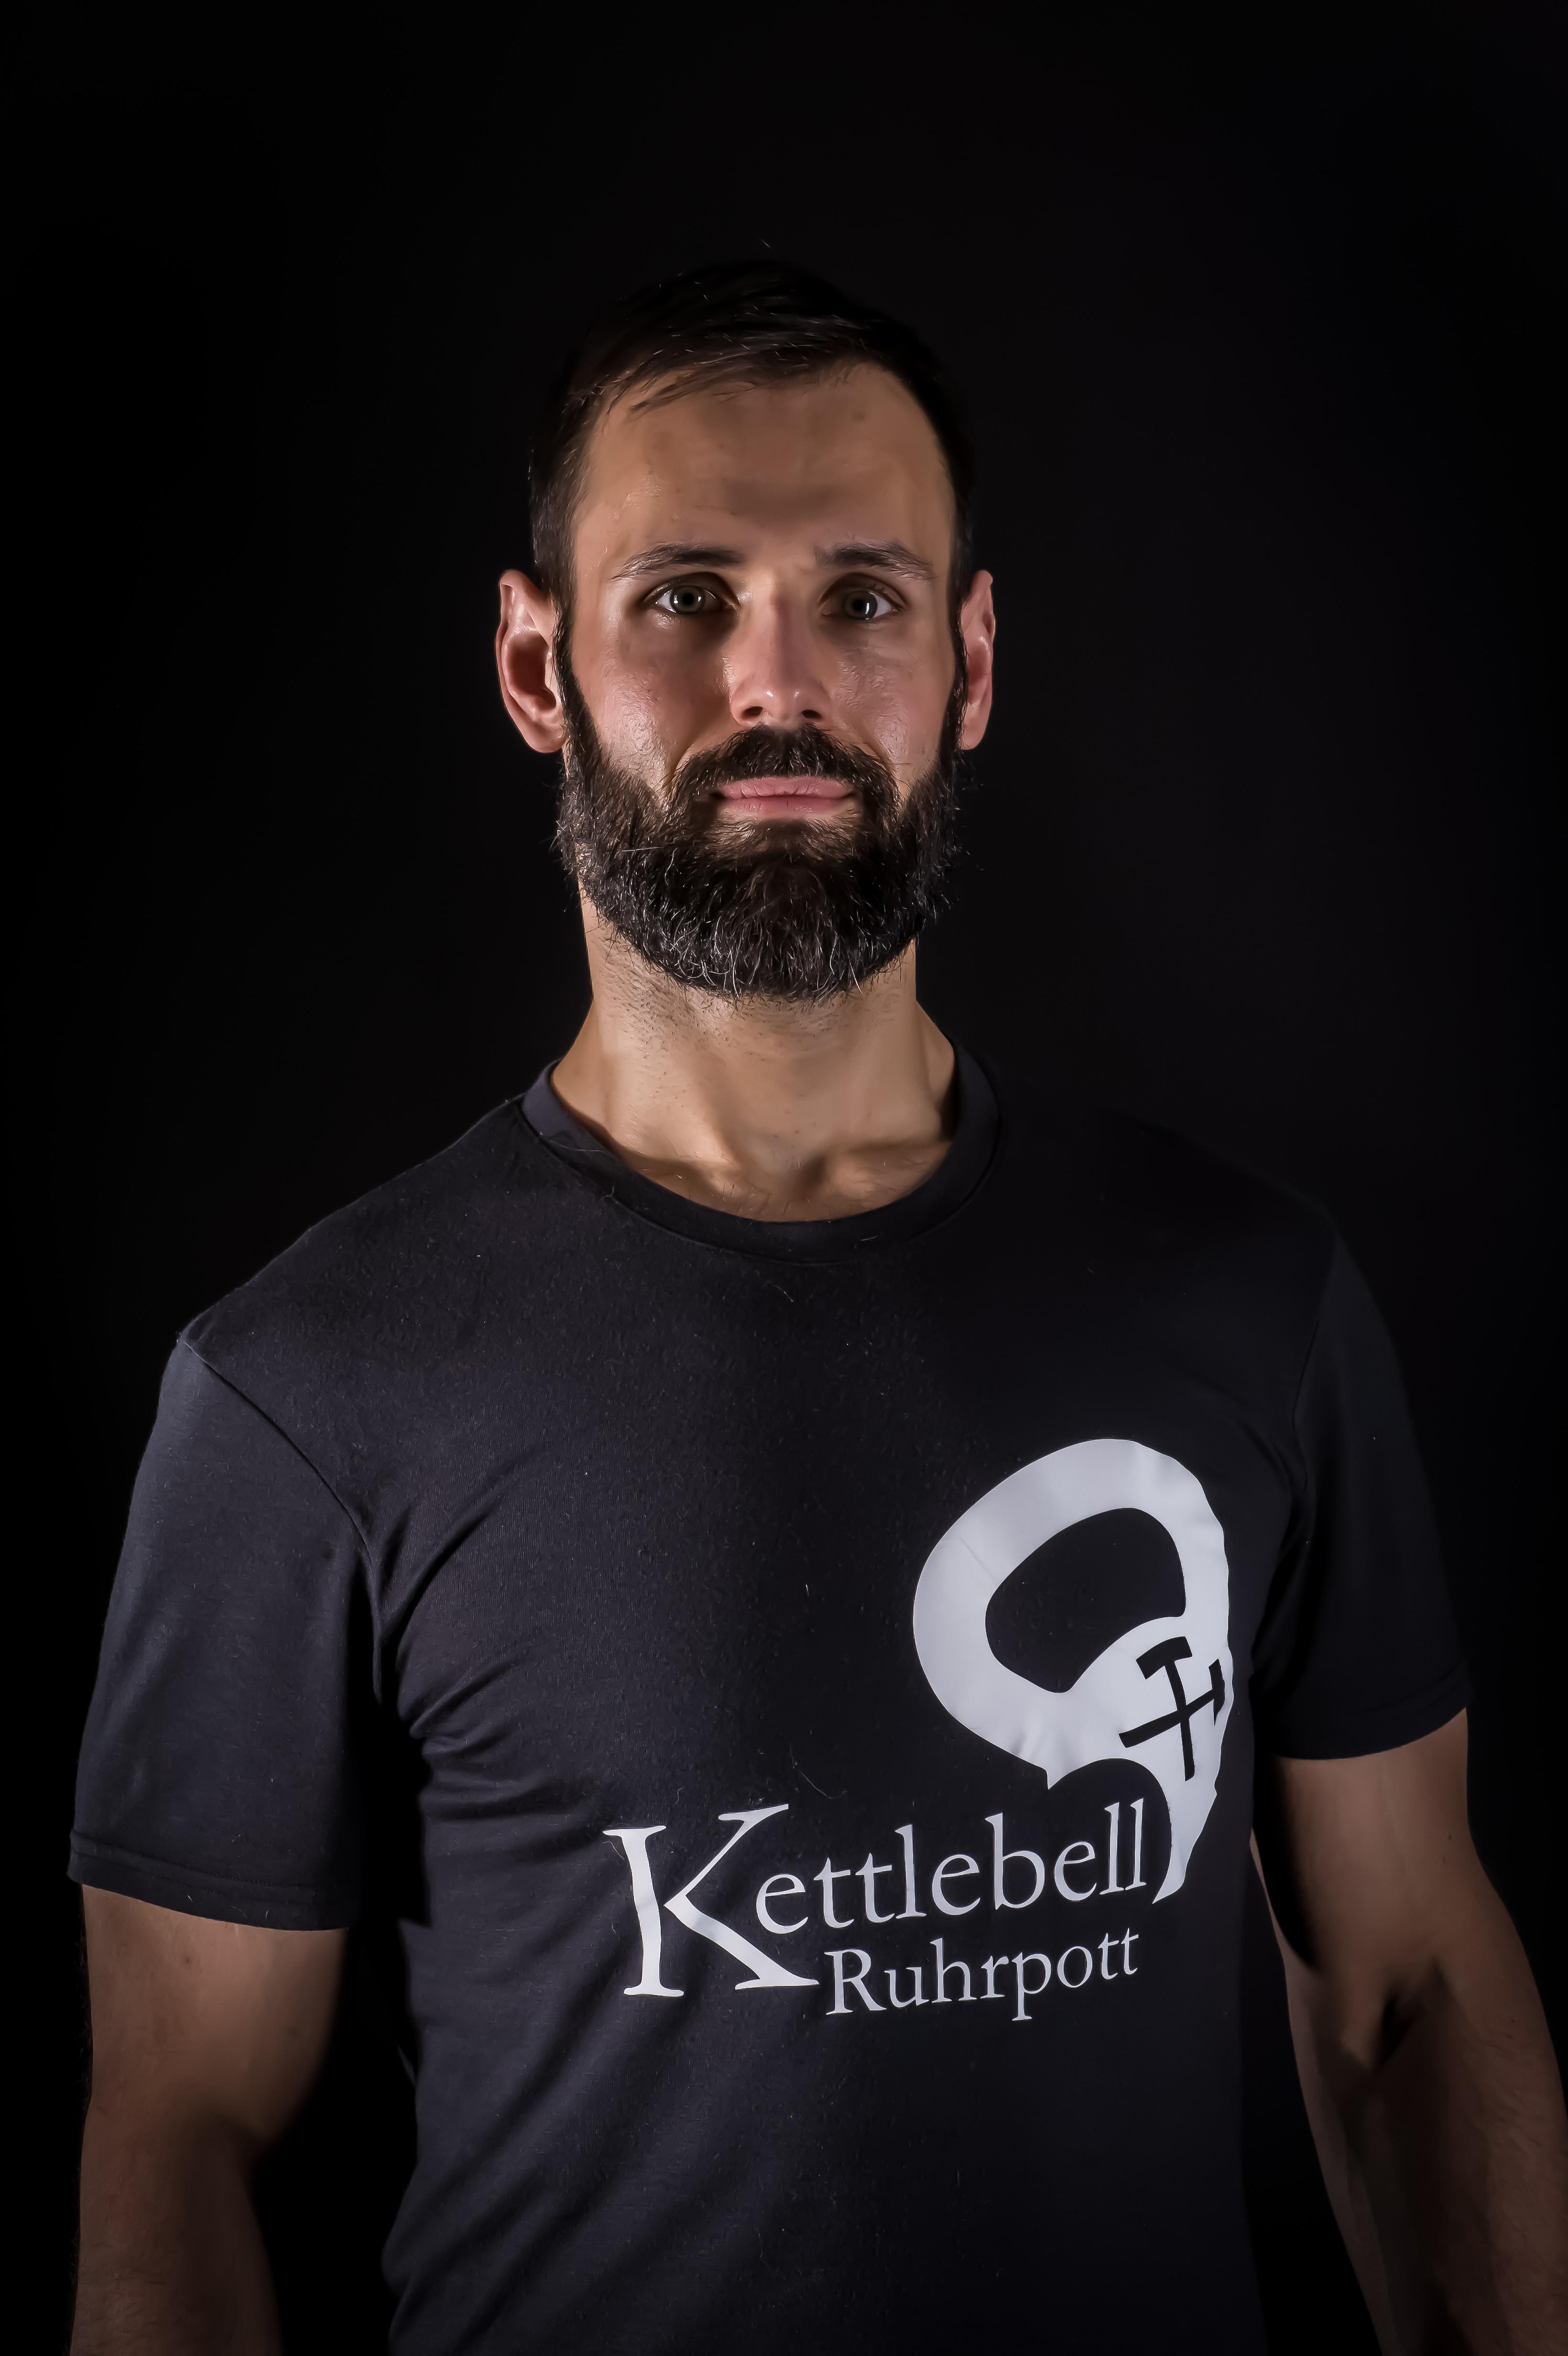 Kettlebell Ruhrpott